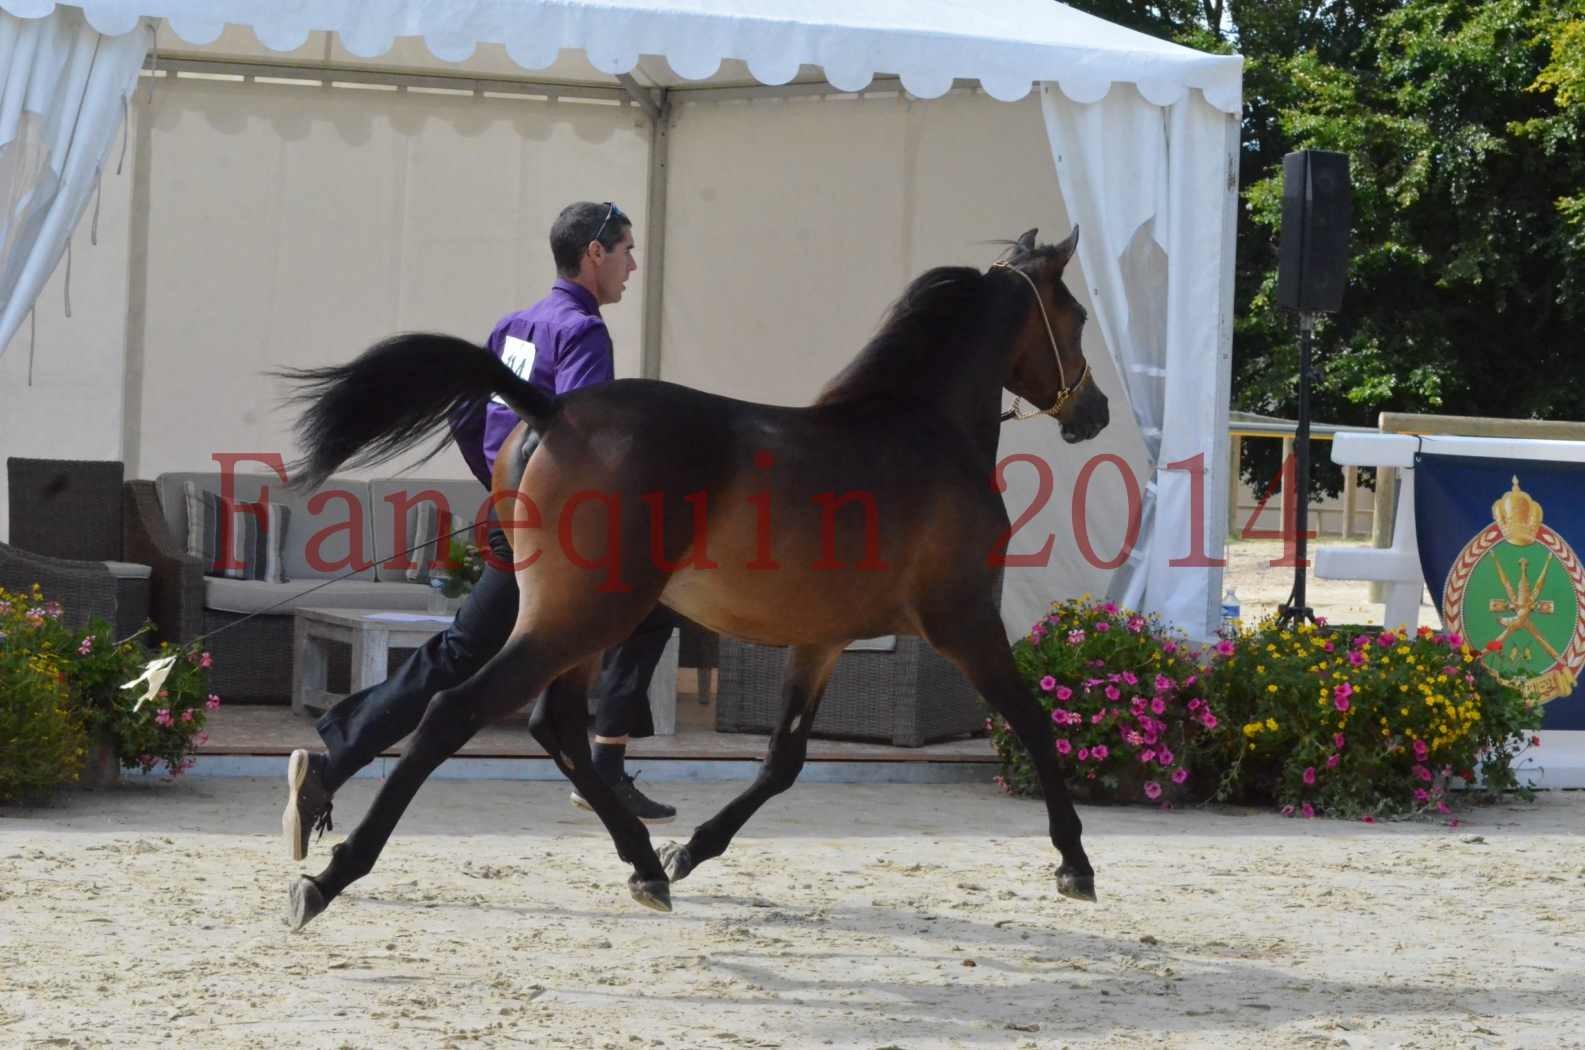 Championnat de FRANCE 2014 - Amateurs - SH FARAJAA - 06